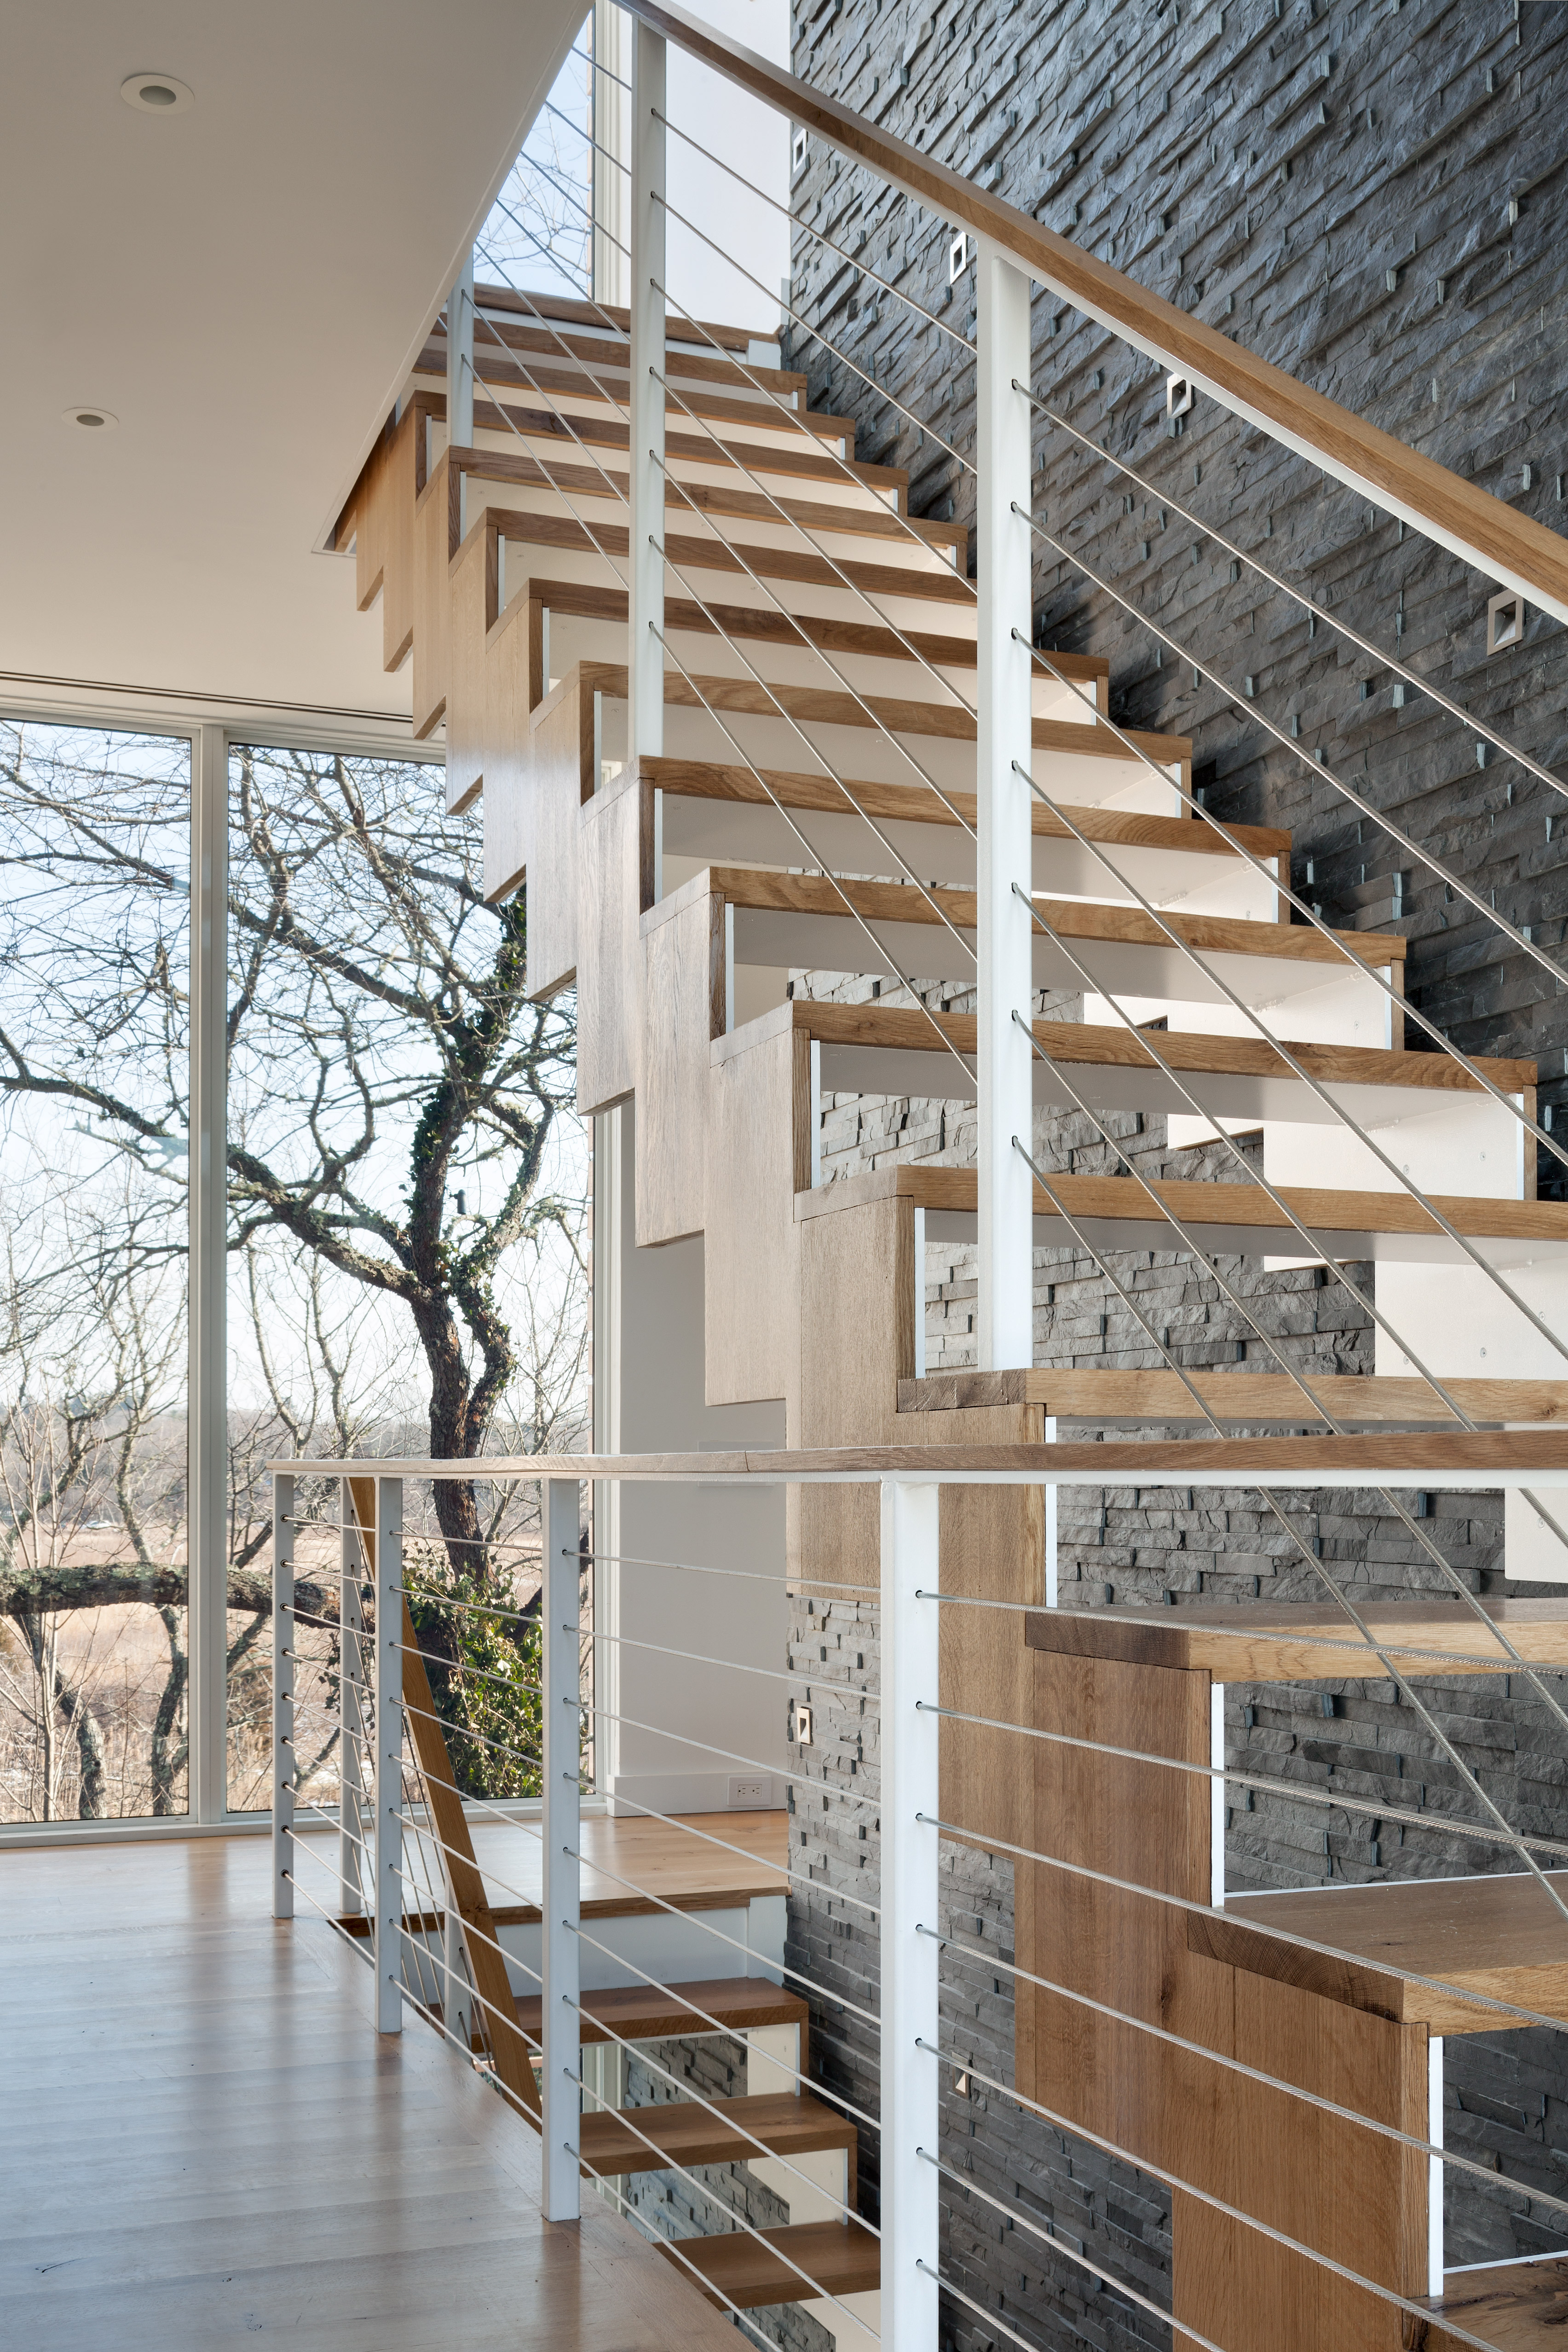 watch-hill-house-lubrano-ciavarra-architects_dezeen_3408_14.jpg (3408×5111)